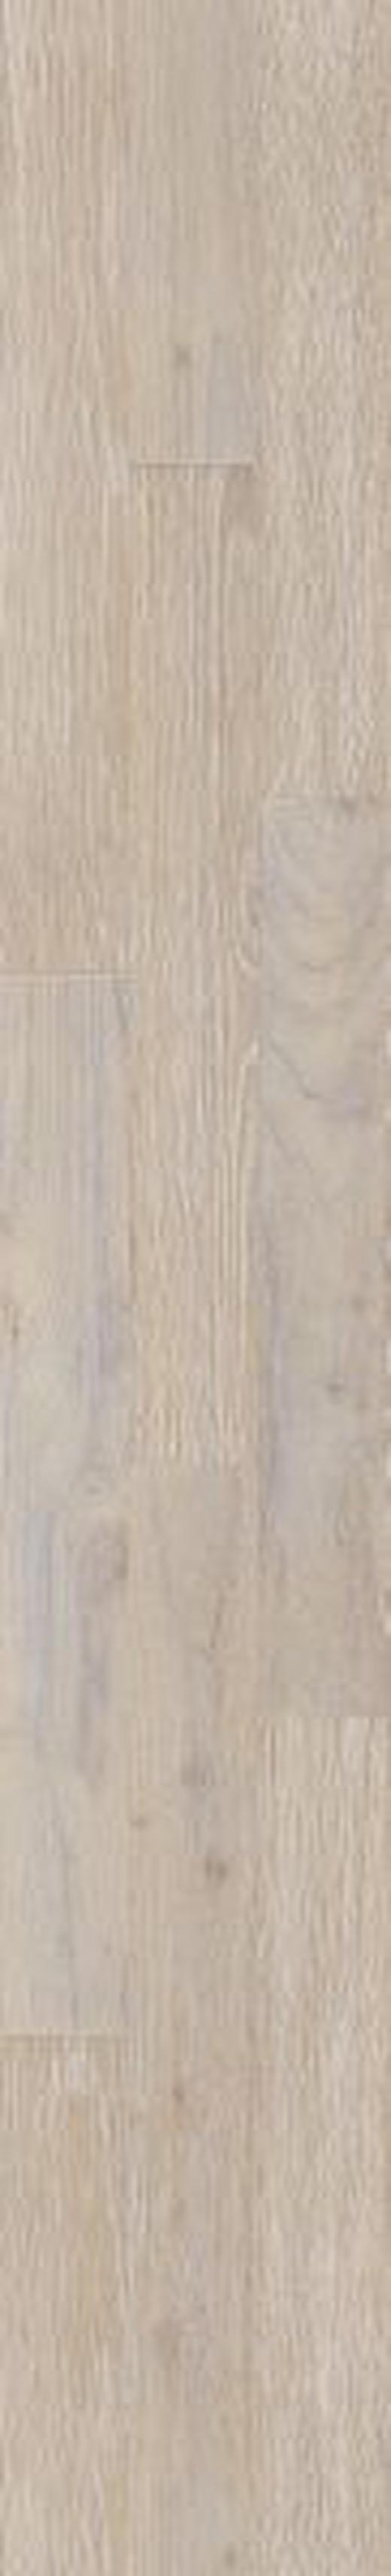 LAMINATBODEN  Eichefarben  per m² - Eichefarben, Basics, Holz (138/19.3/0.8cm) - Venda